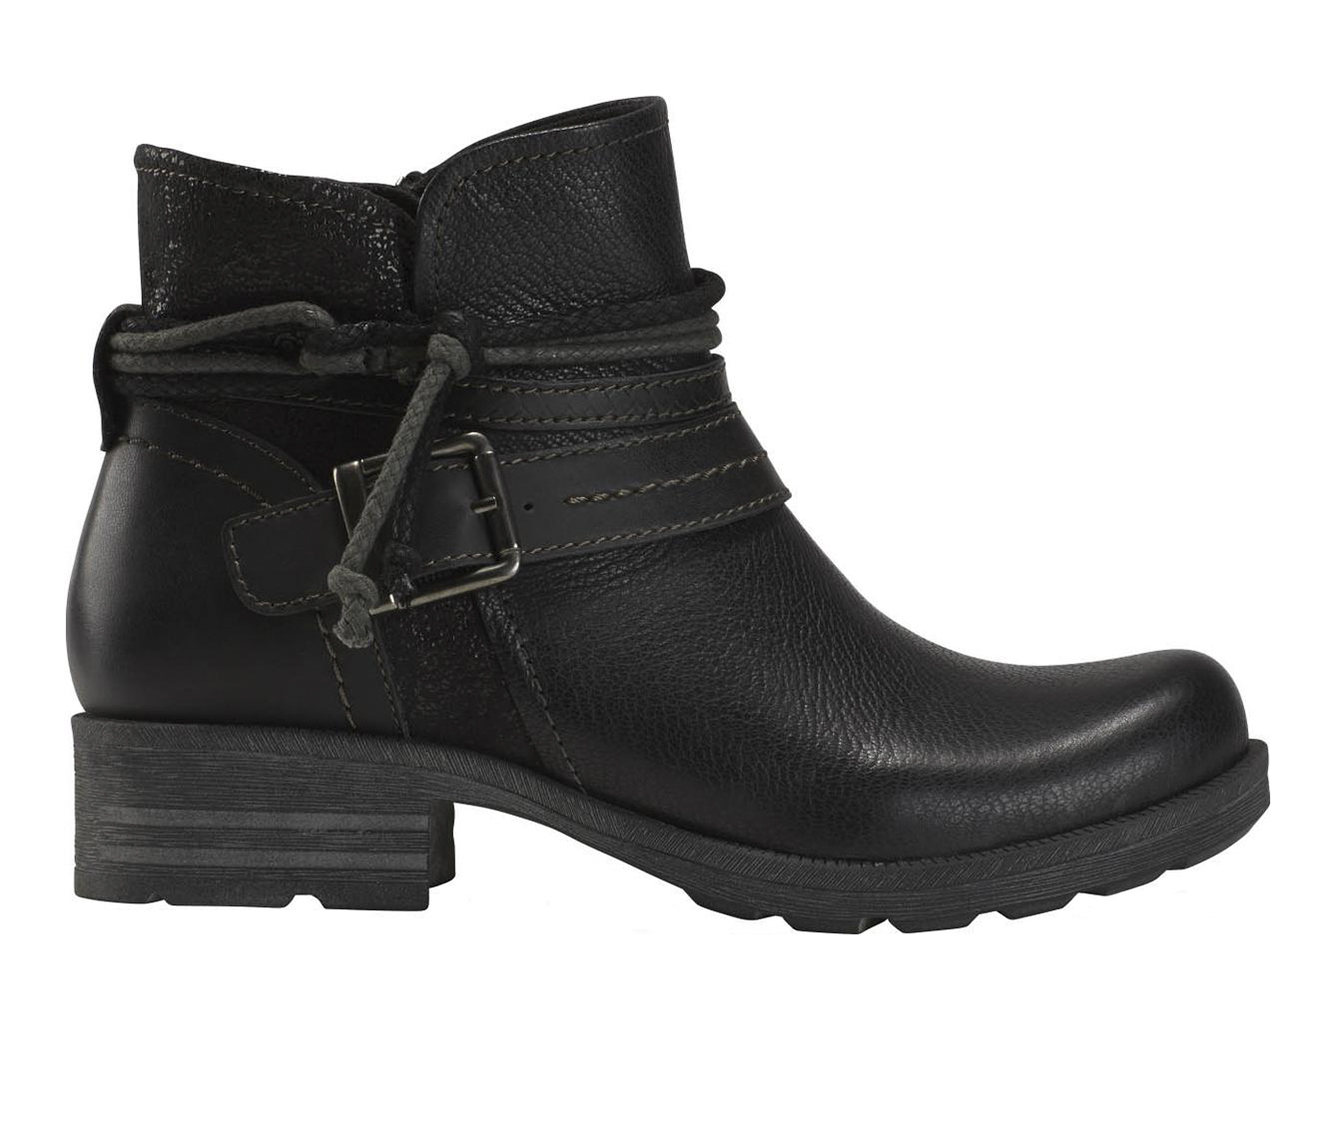 Earth Origins Randi Radley Women's Boots (Black - Leather)